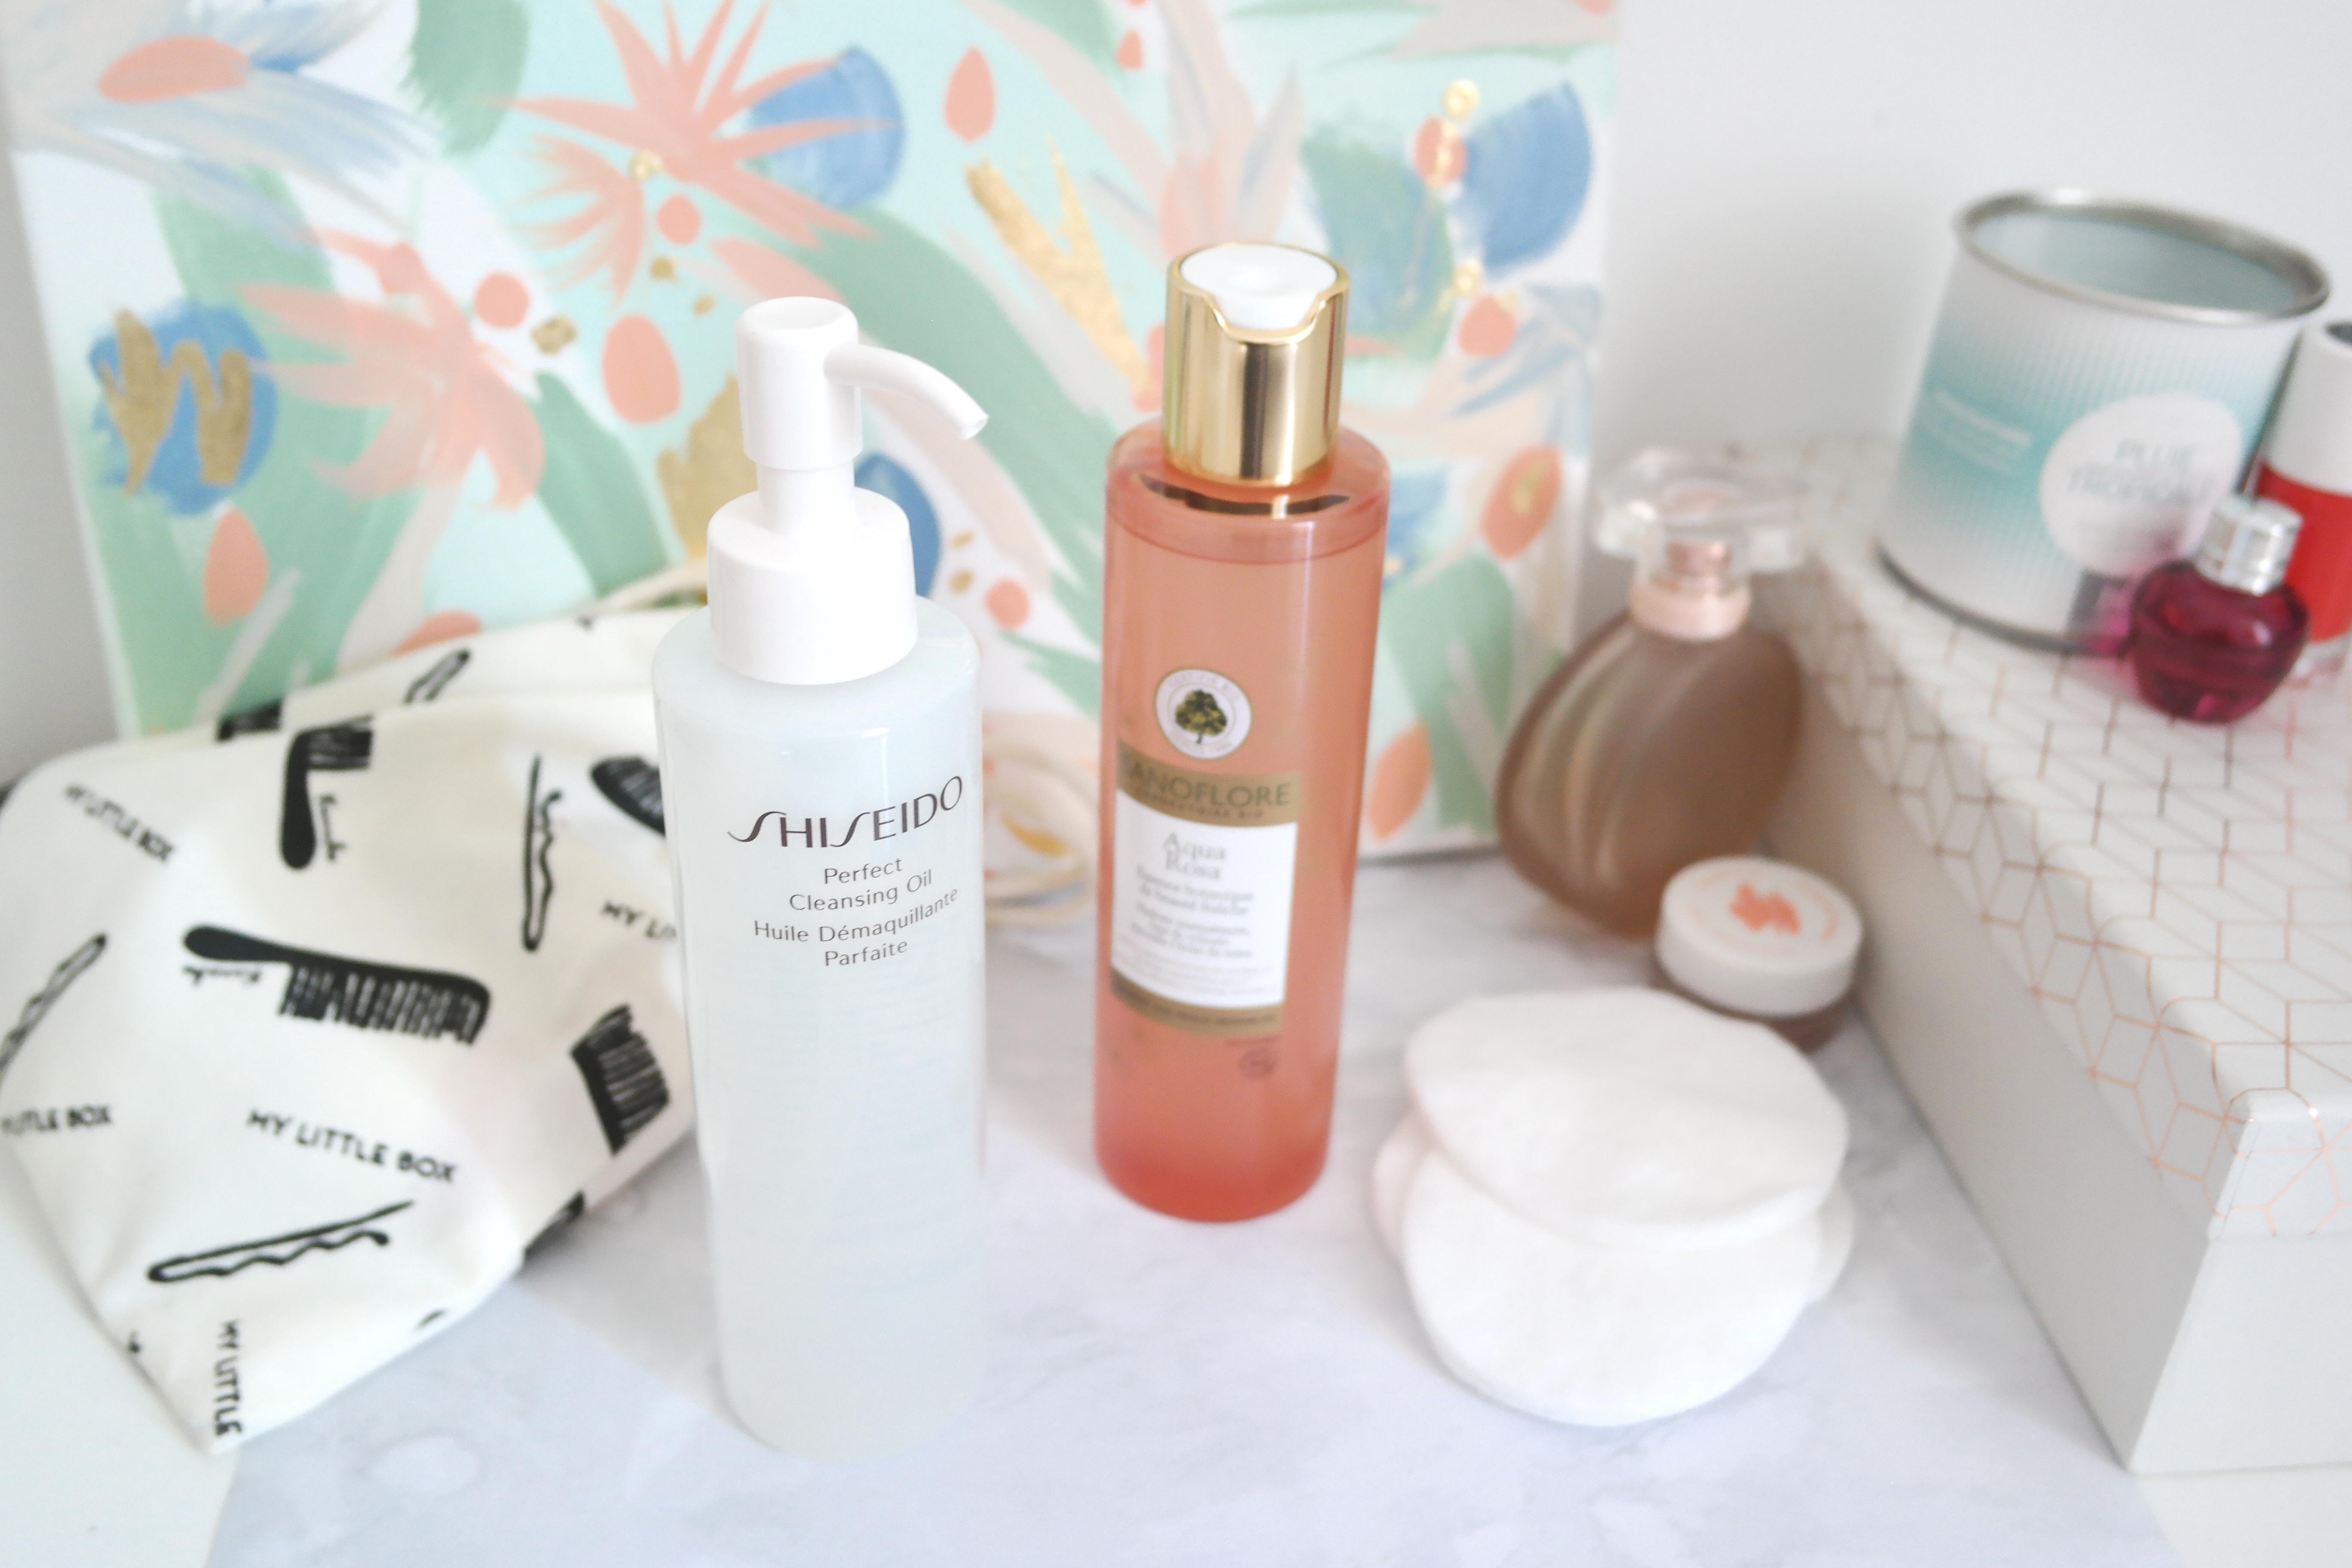 shiseido-huile-demaquillante-sanoflore-aqua-rosa